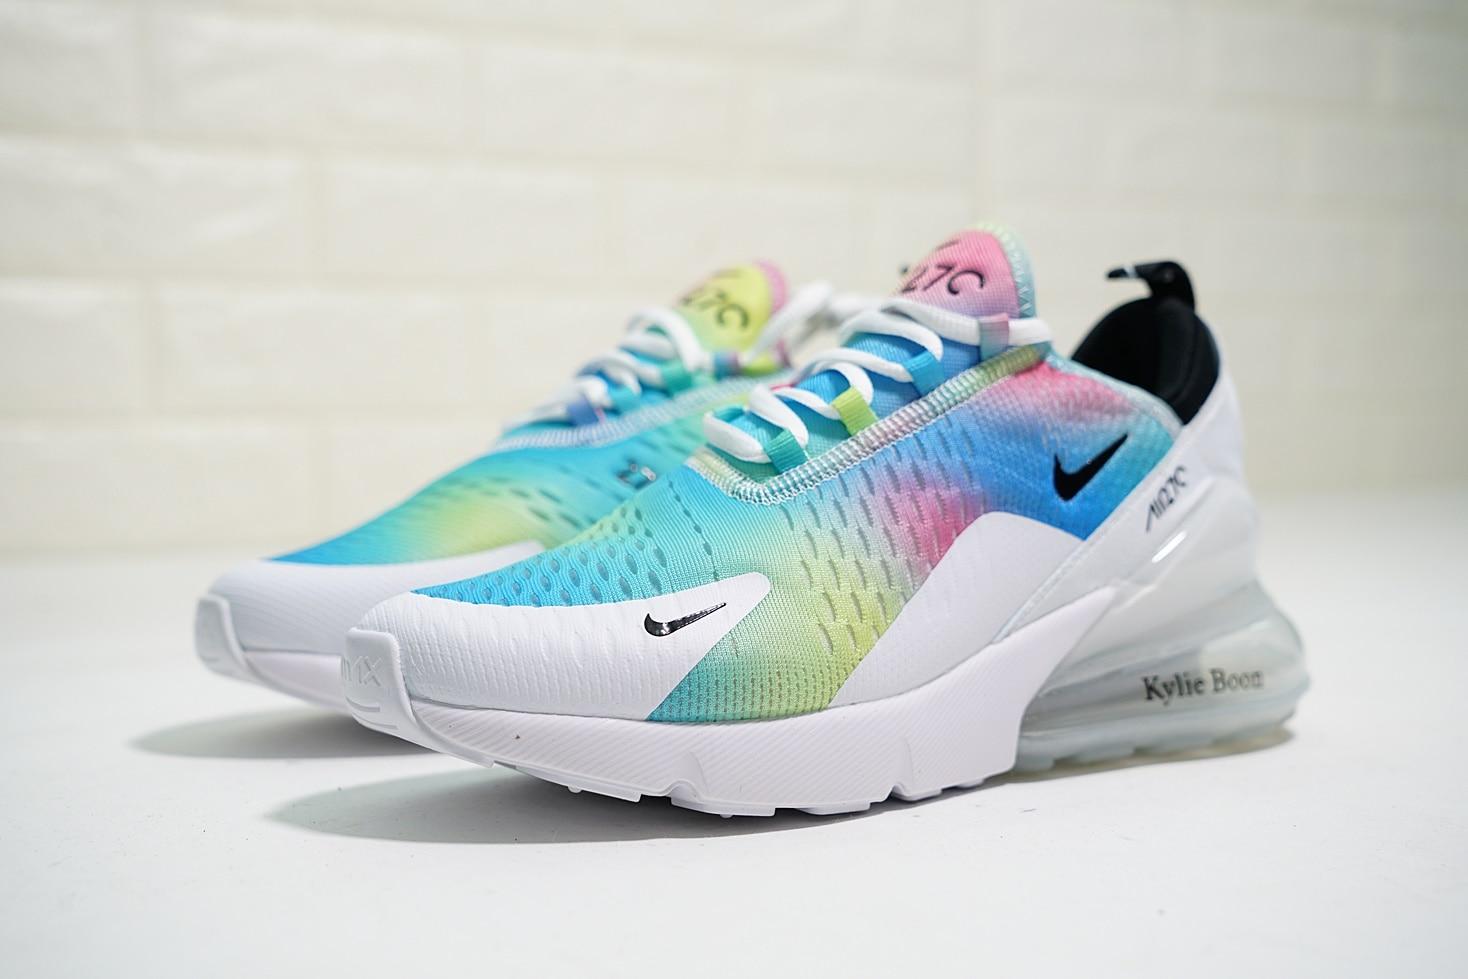 Nike Air Max 270 White Rainbow Multi Color Sneakers AH6789